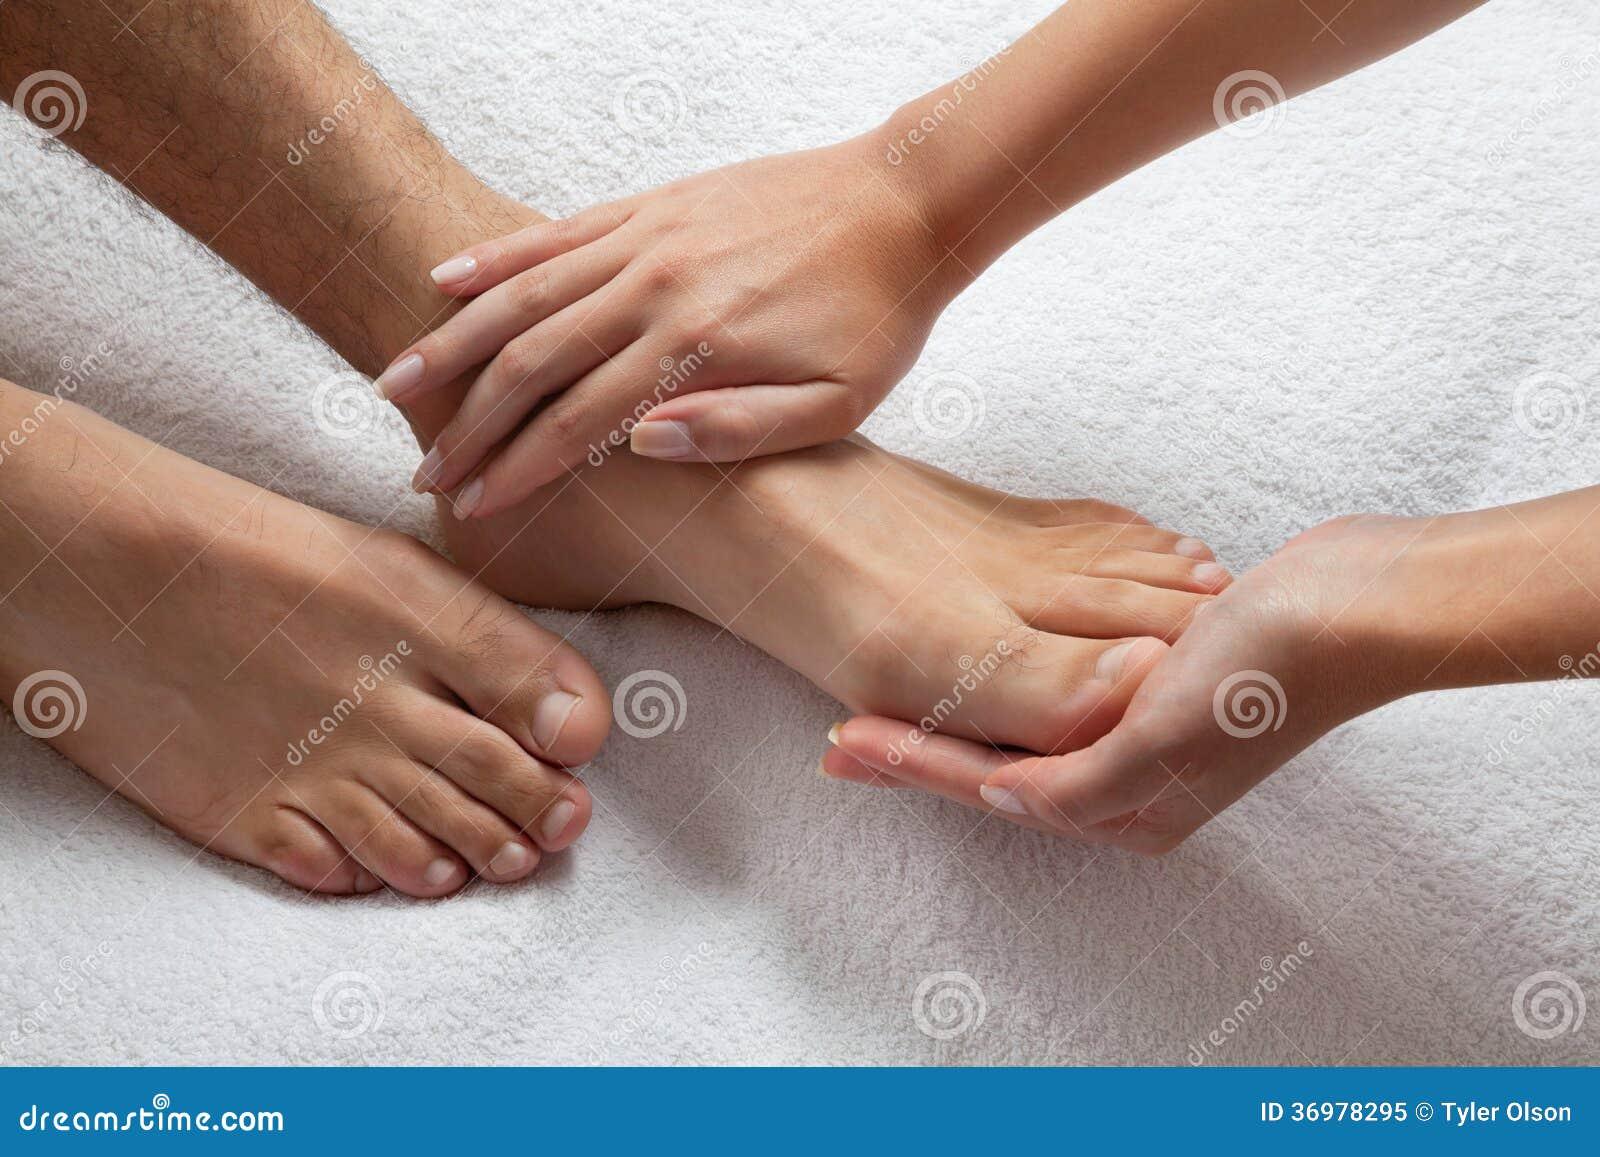 massage  happy ending sex ads sydney